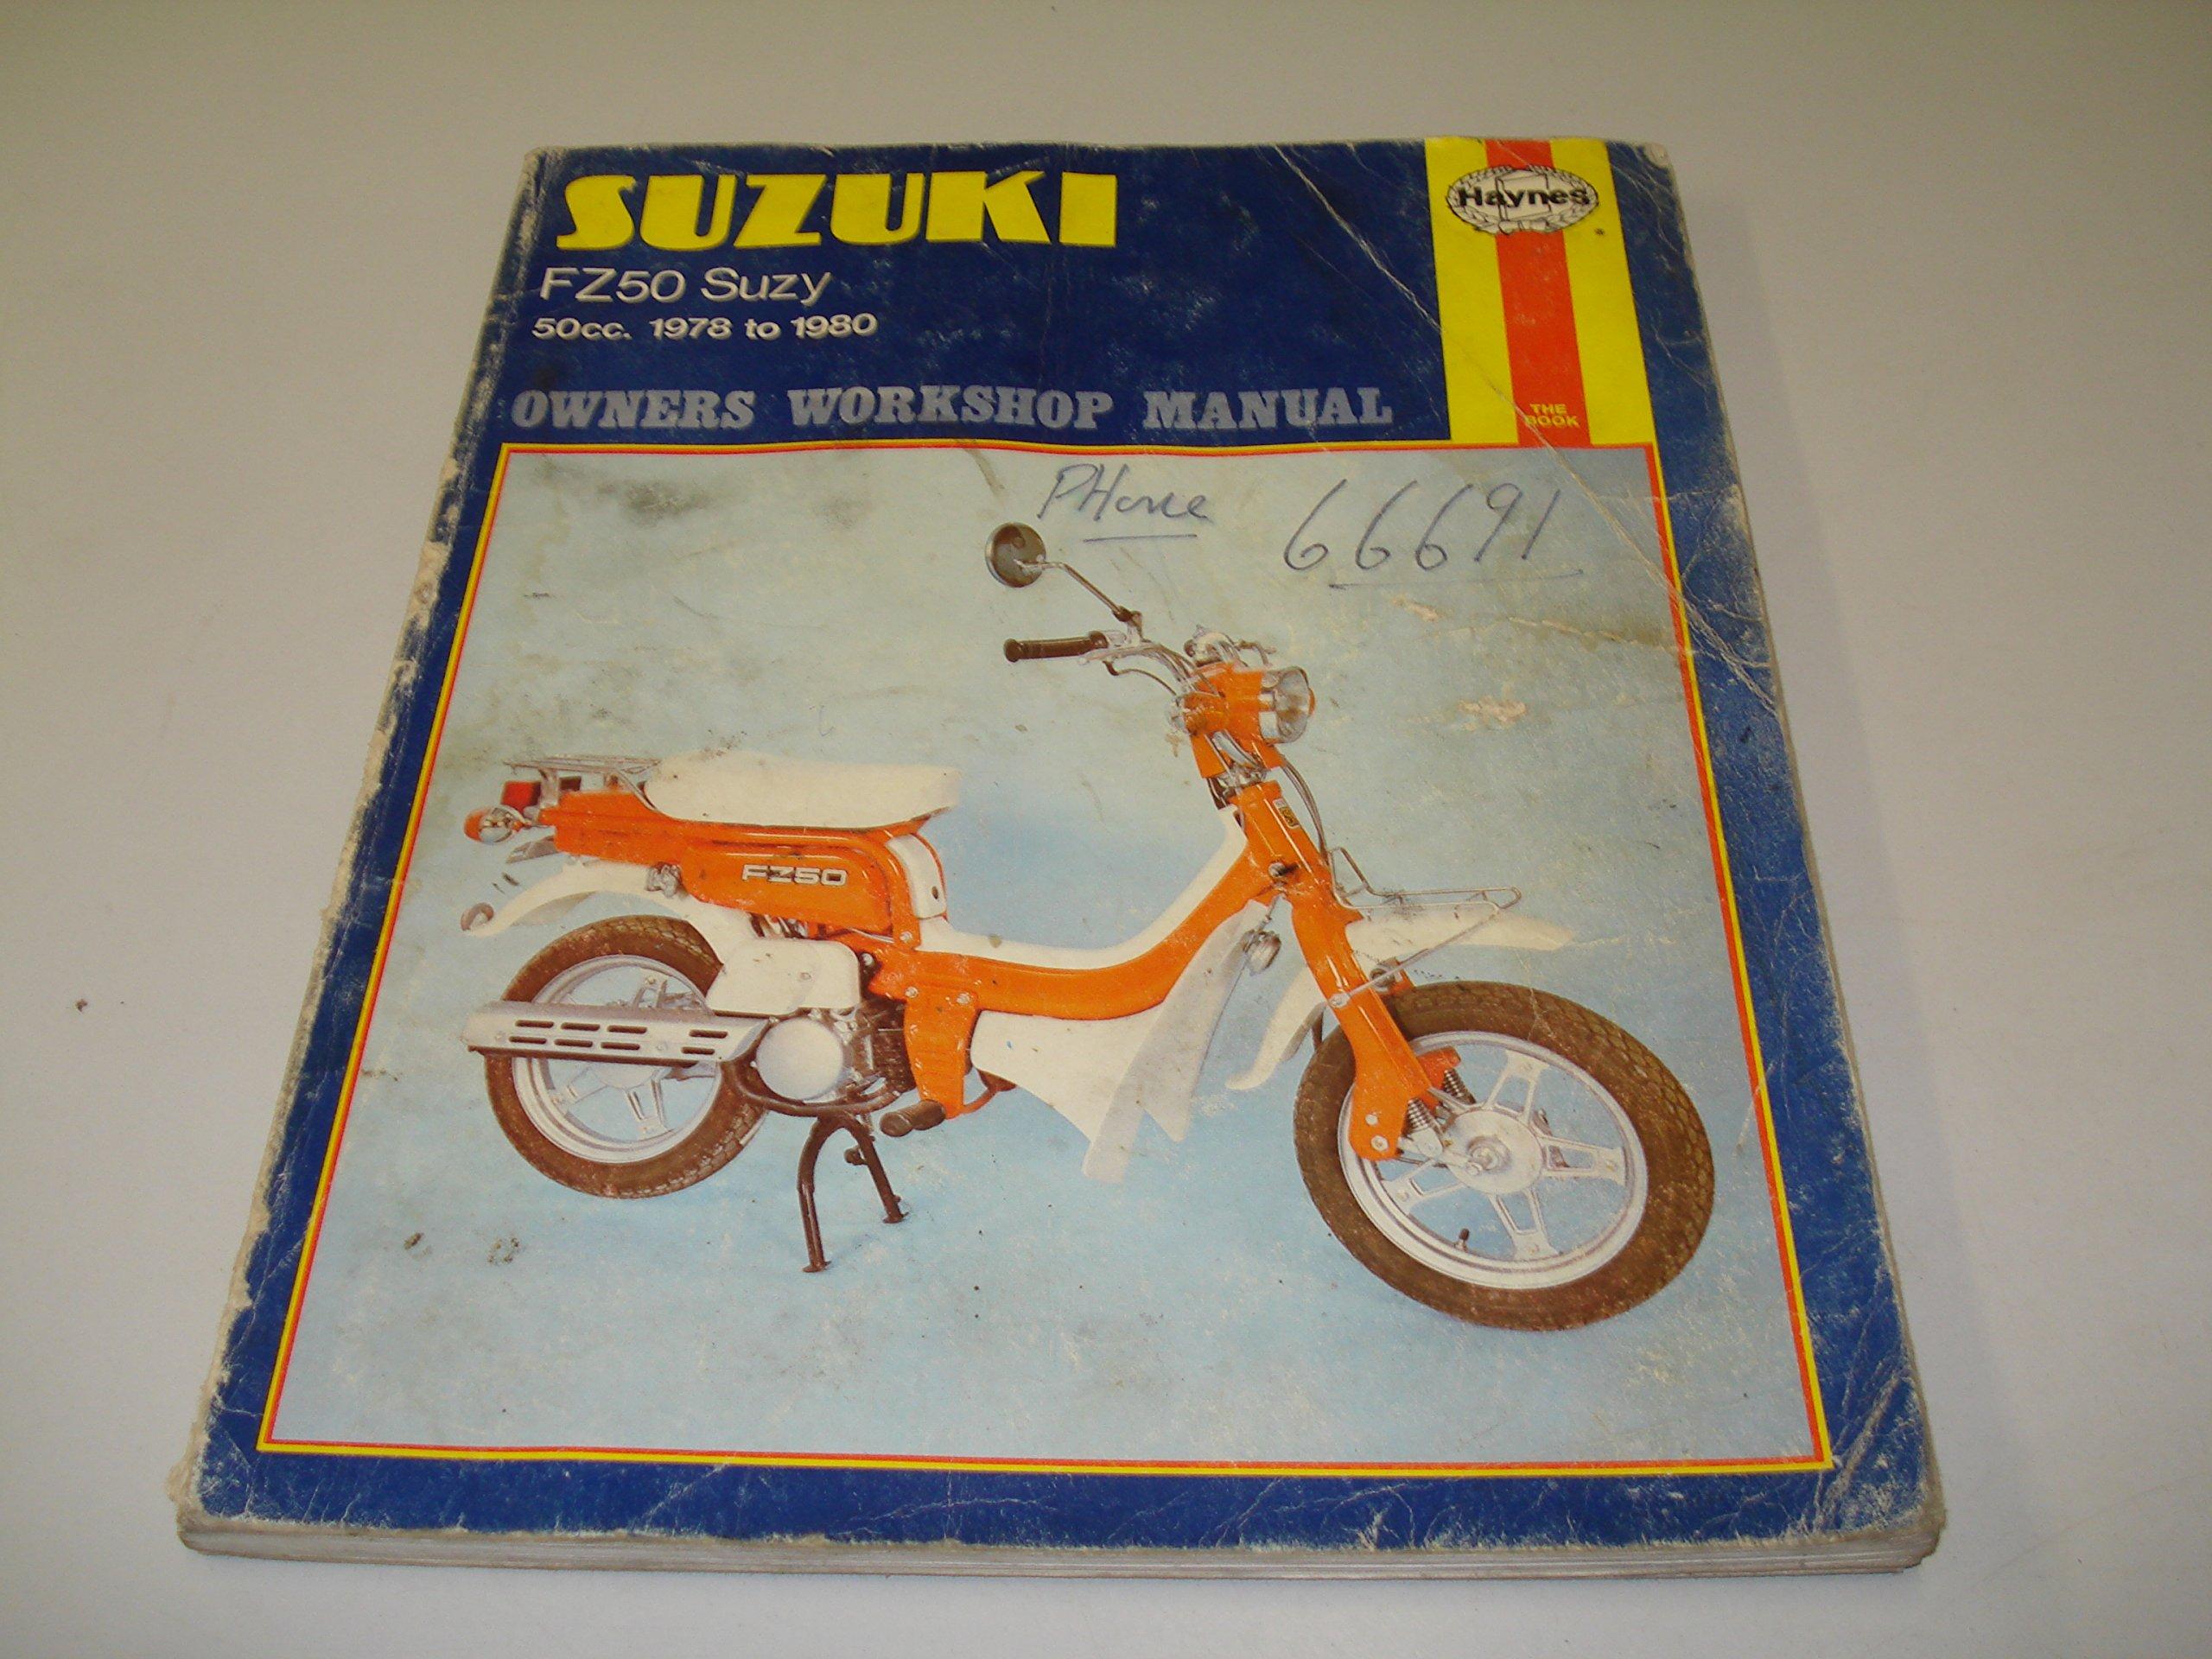 suzuki fz50 owners manual Array - suzuki fz50 owners workshop manual hayne  u0027s automotive repair manual rh amazon com